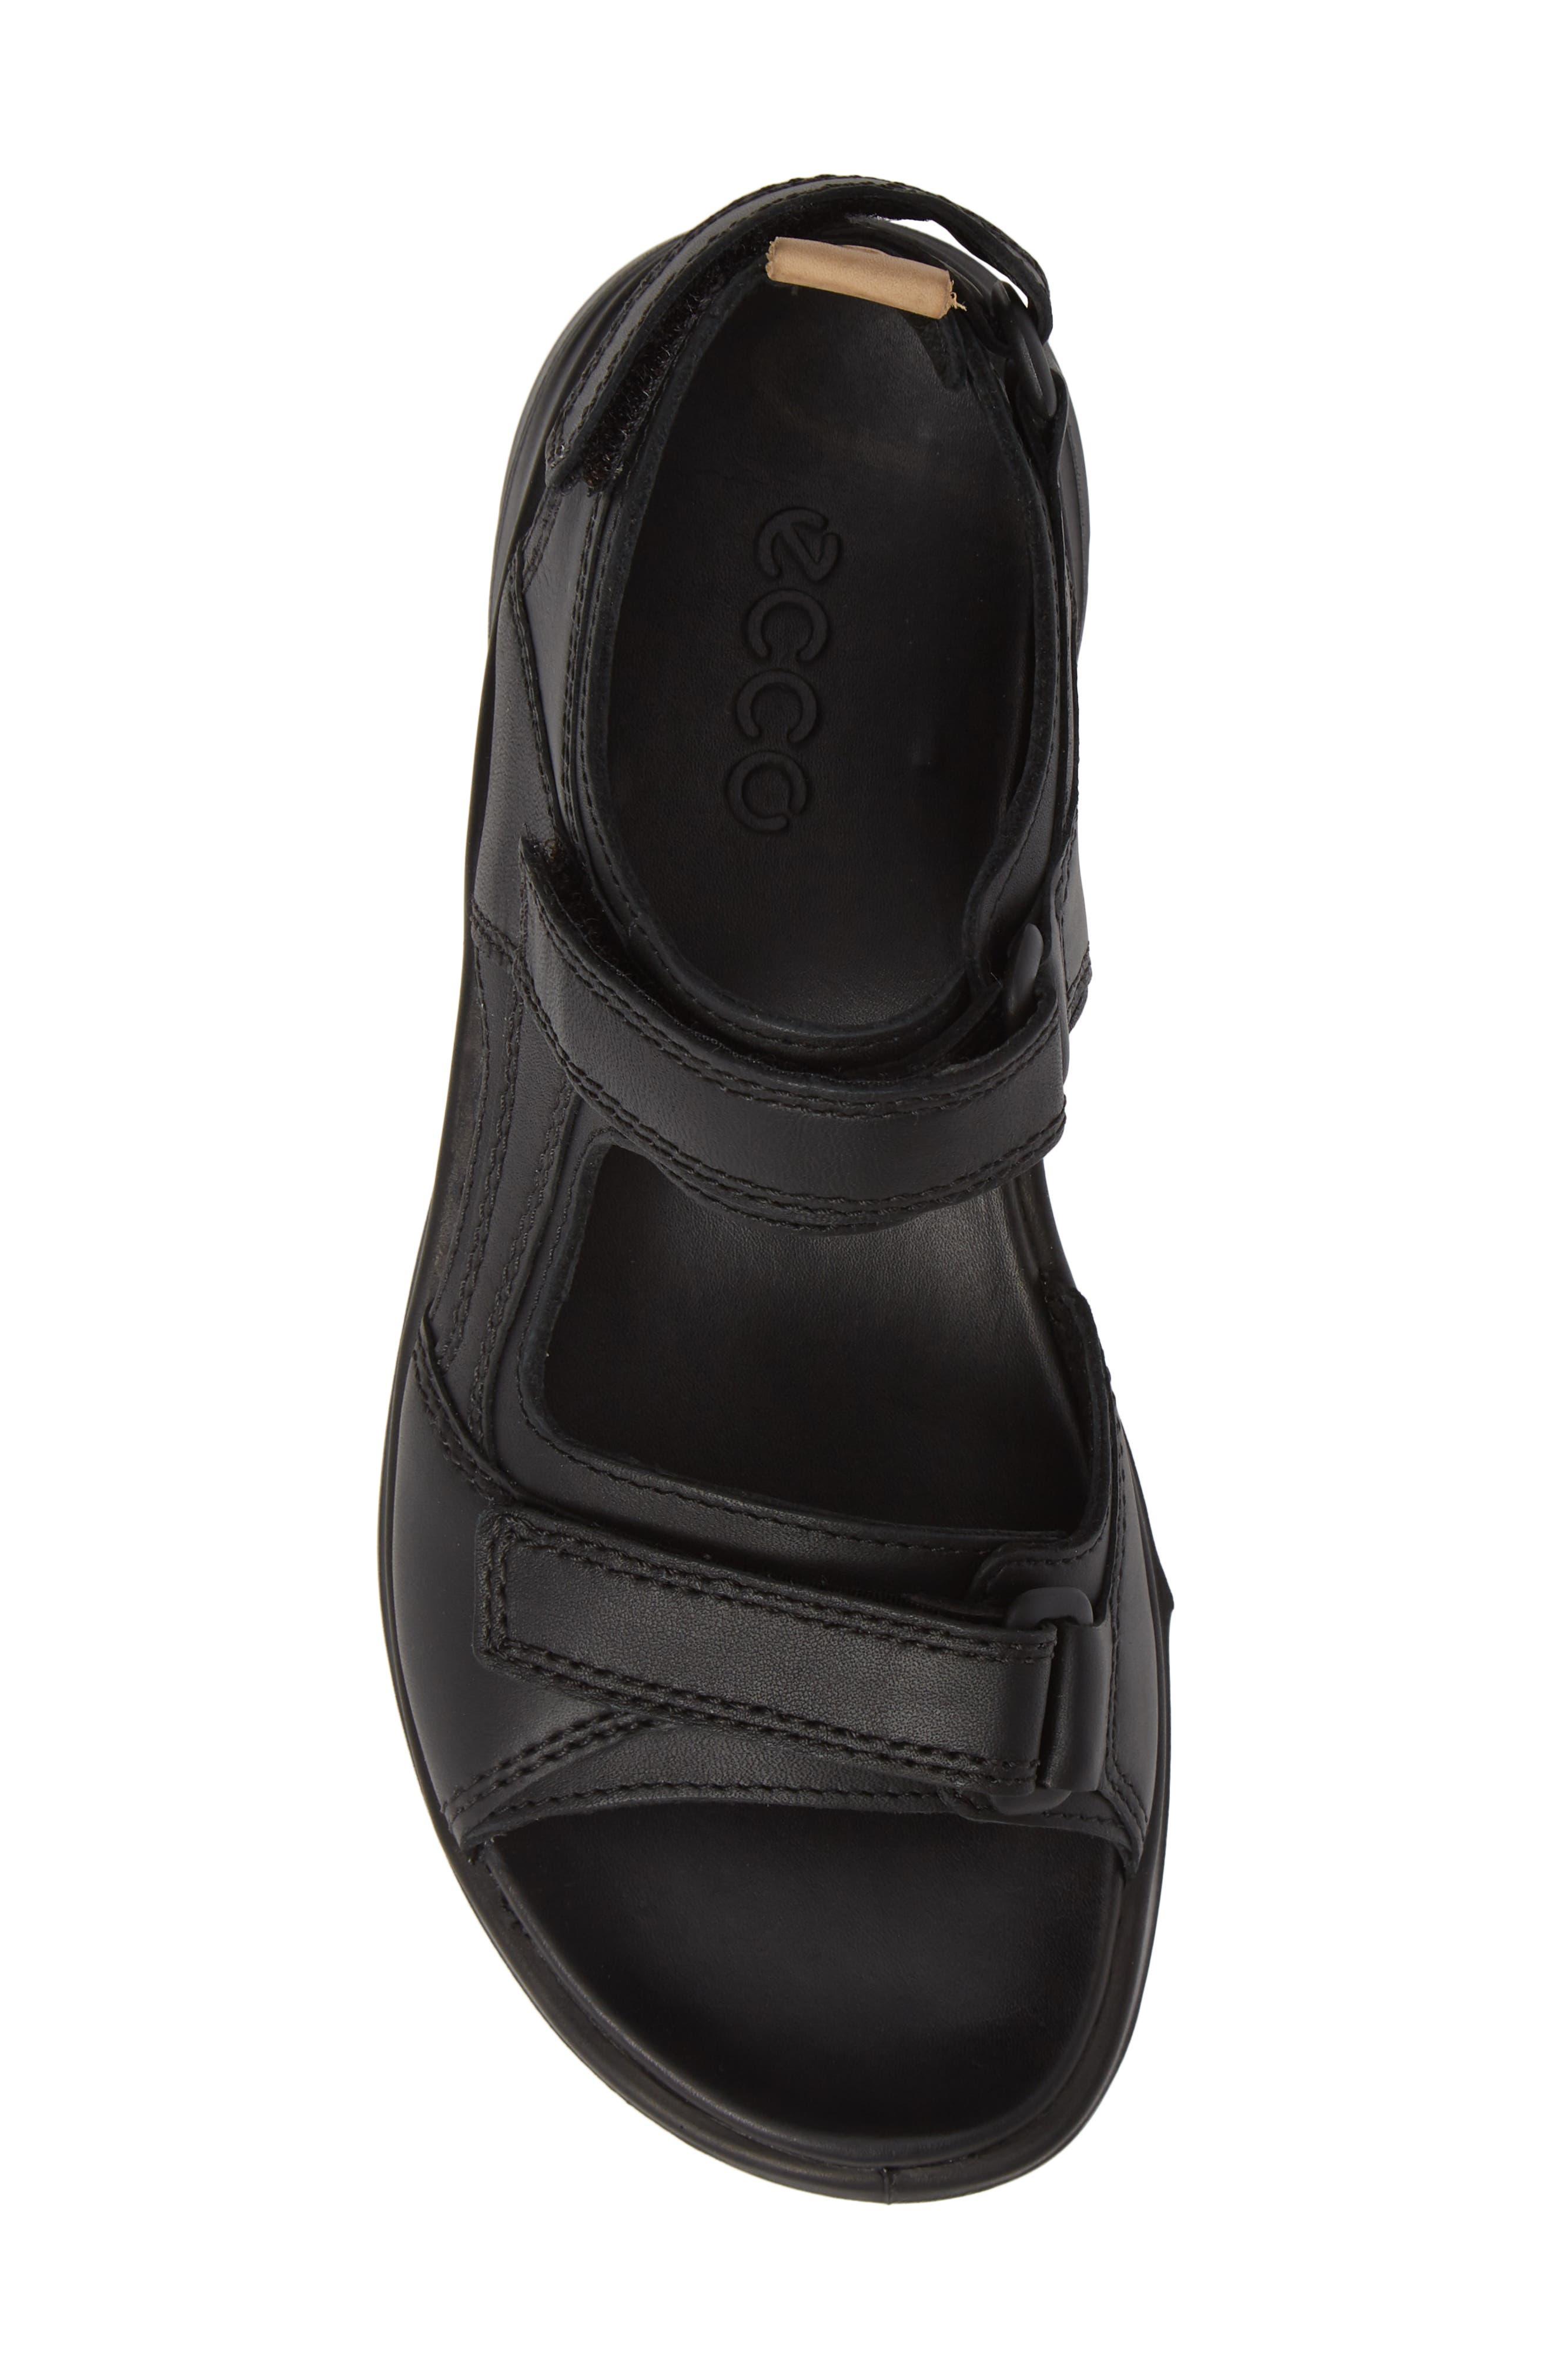 Premium Offroad Sandal,                             Alternate thumbnail 5, color,                             BLACK NUBUCK LEATHER